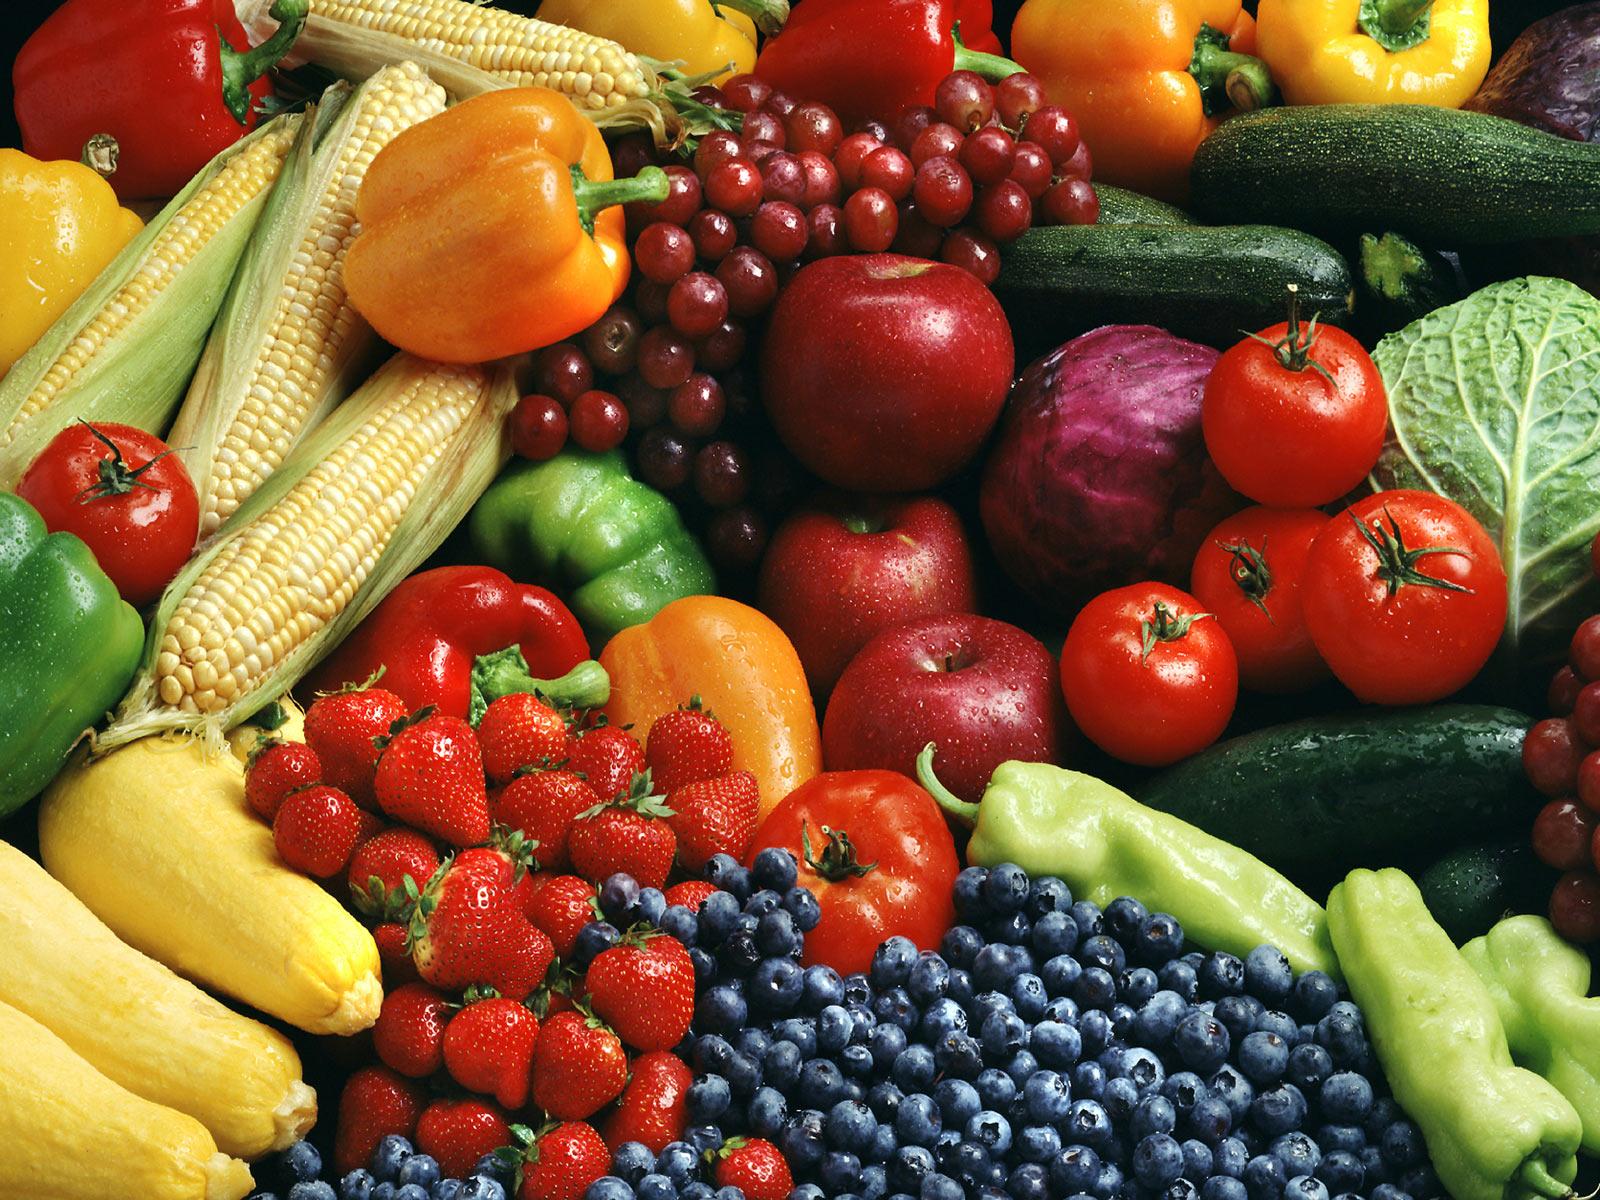 fresh-fruits-vegetables-24191